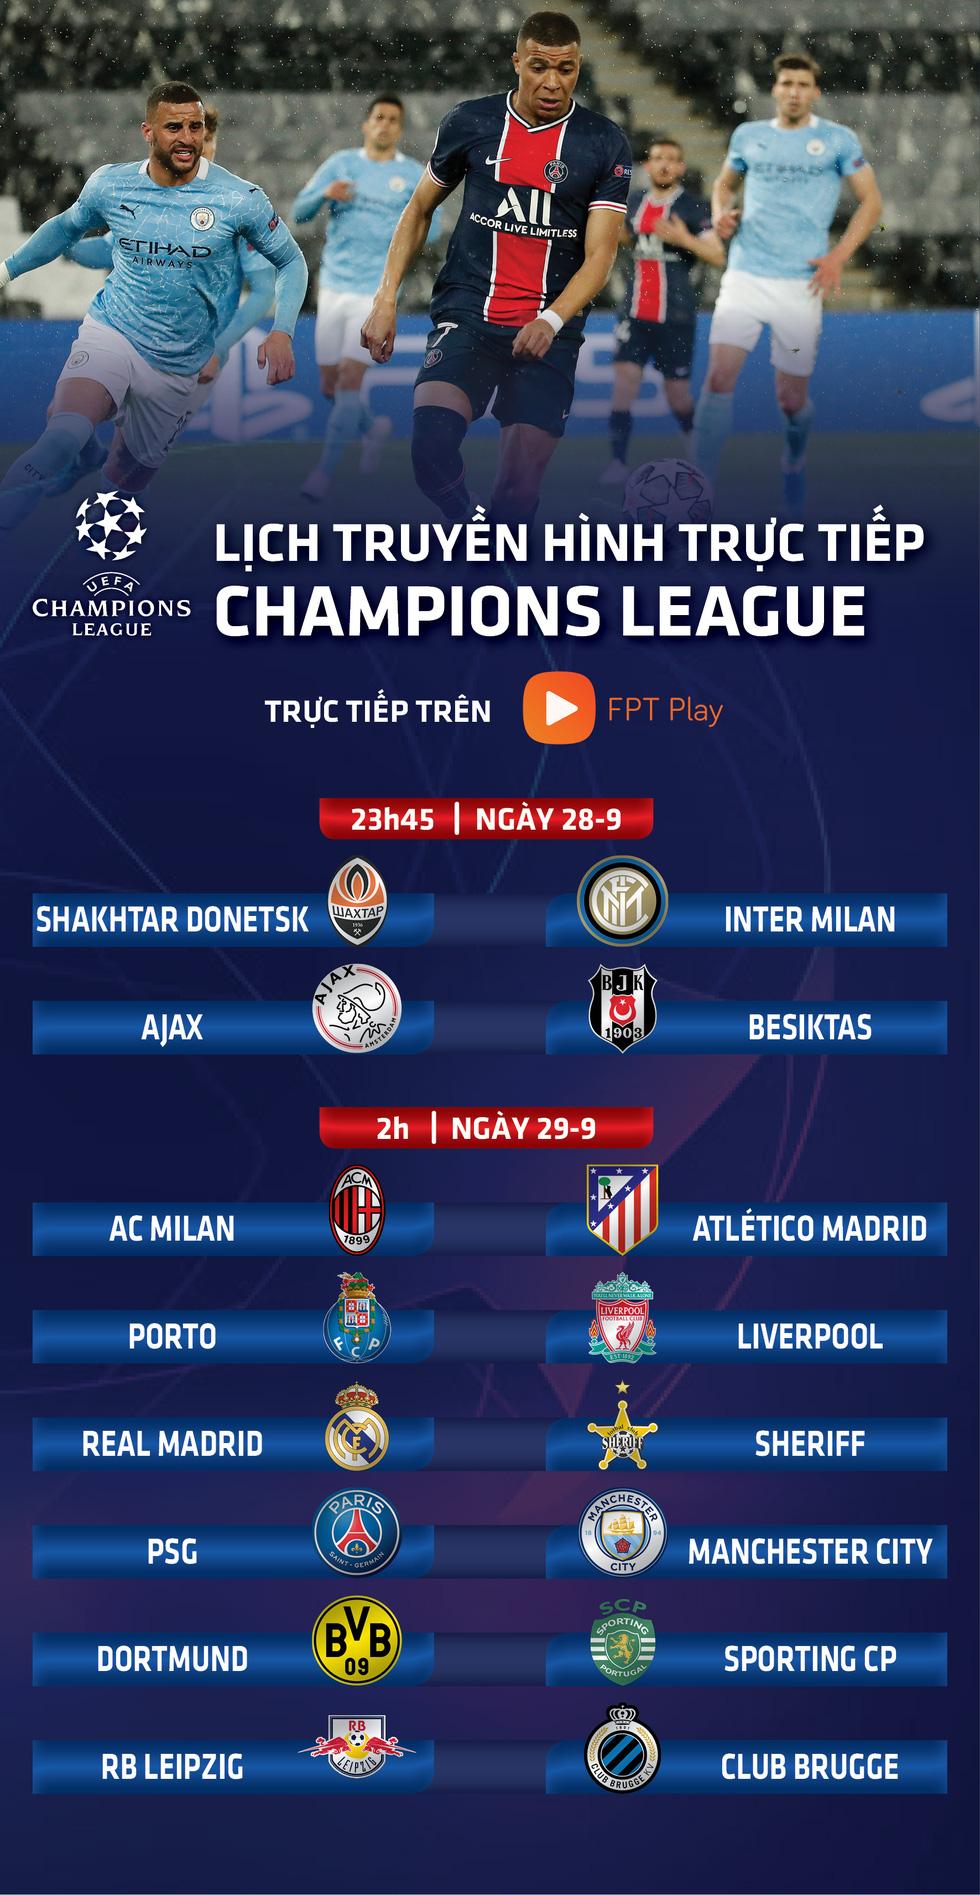 Lịch trực tiếp Champions League: PSG - Man City, AC Milan - Atletico Madrid - Ảnh 1.